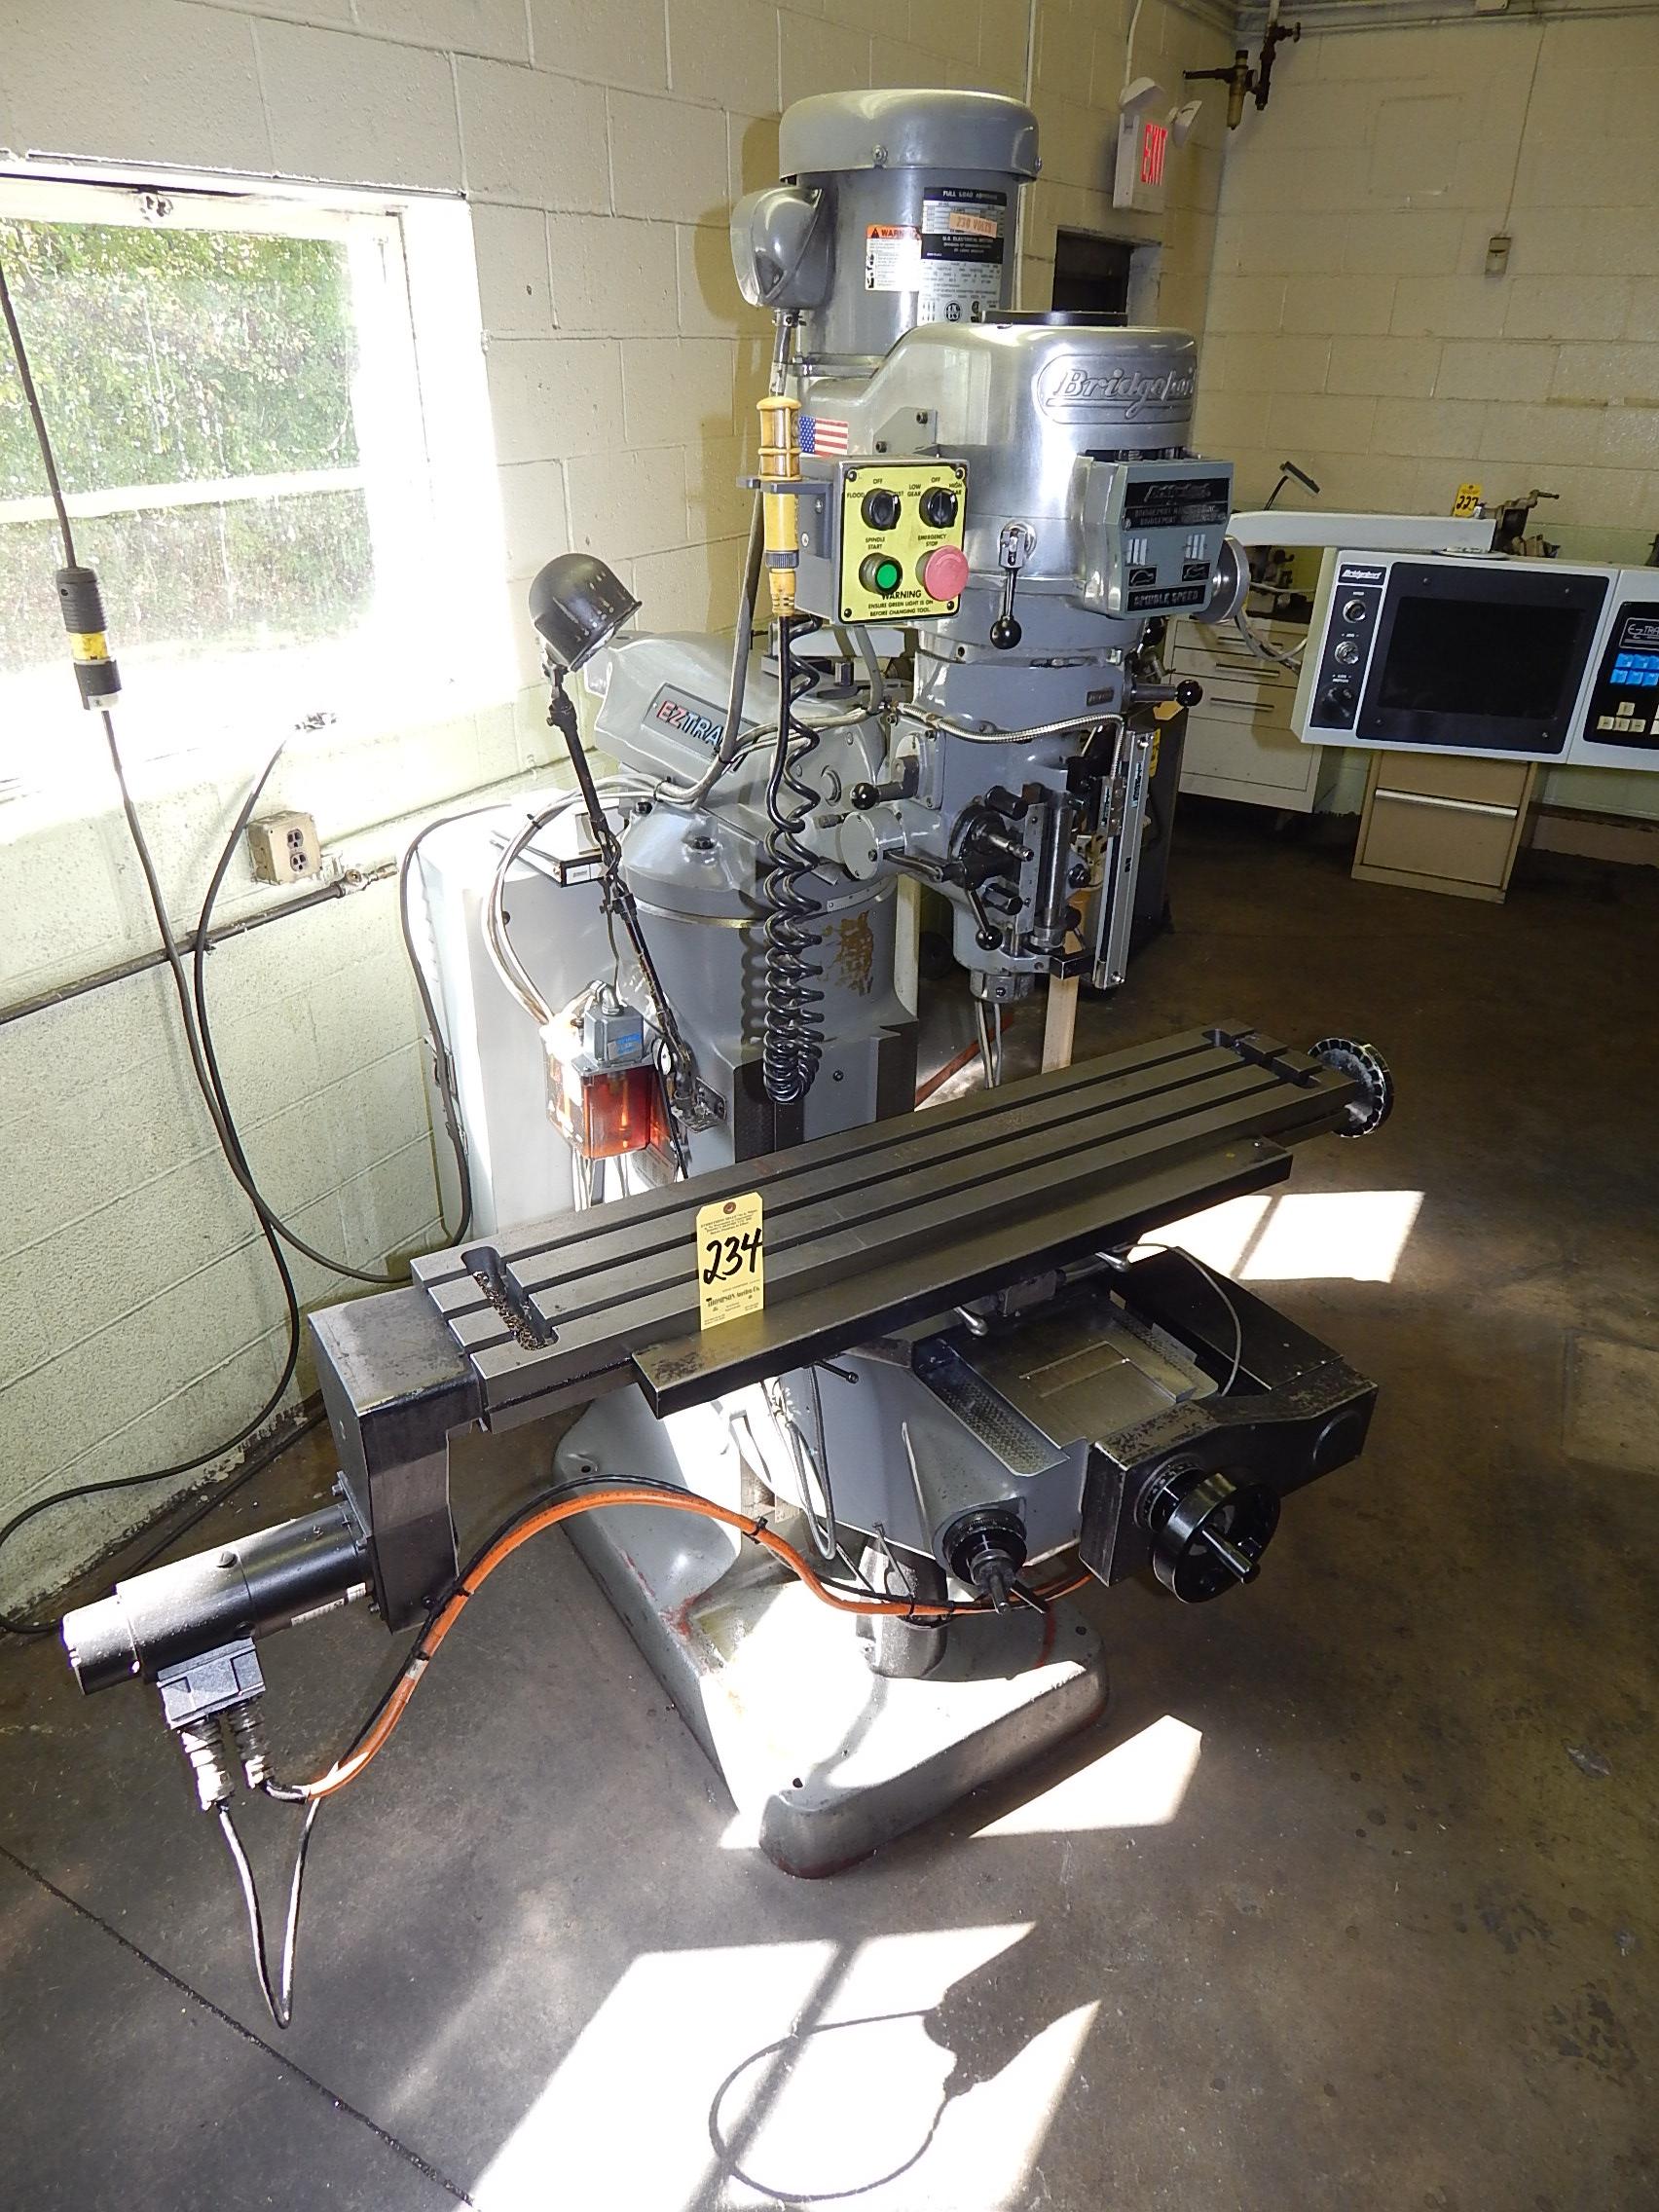 Lot 234 - Bridgeport EZ Trak DX 2-Axis CNC Vertical Mill, s/